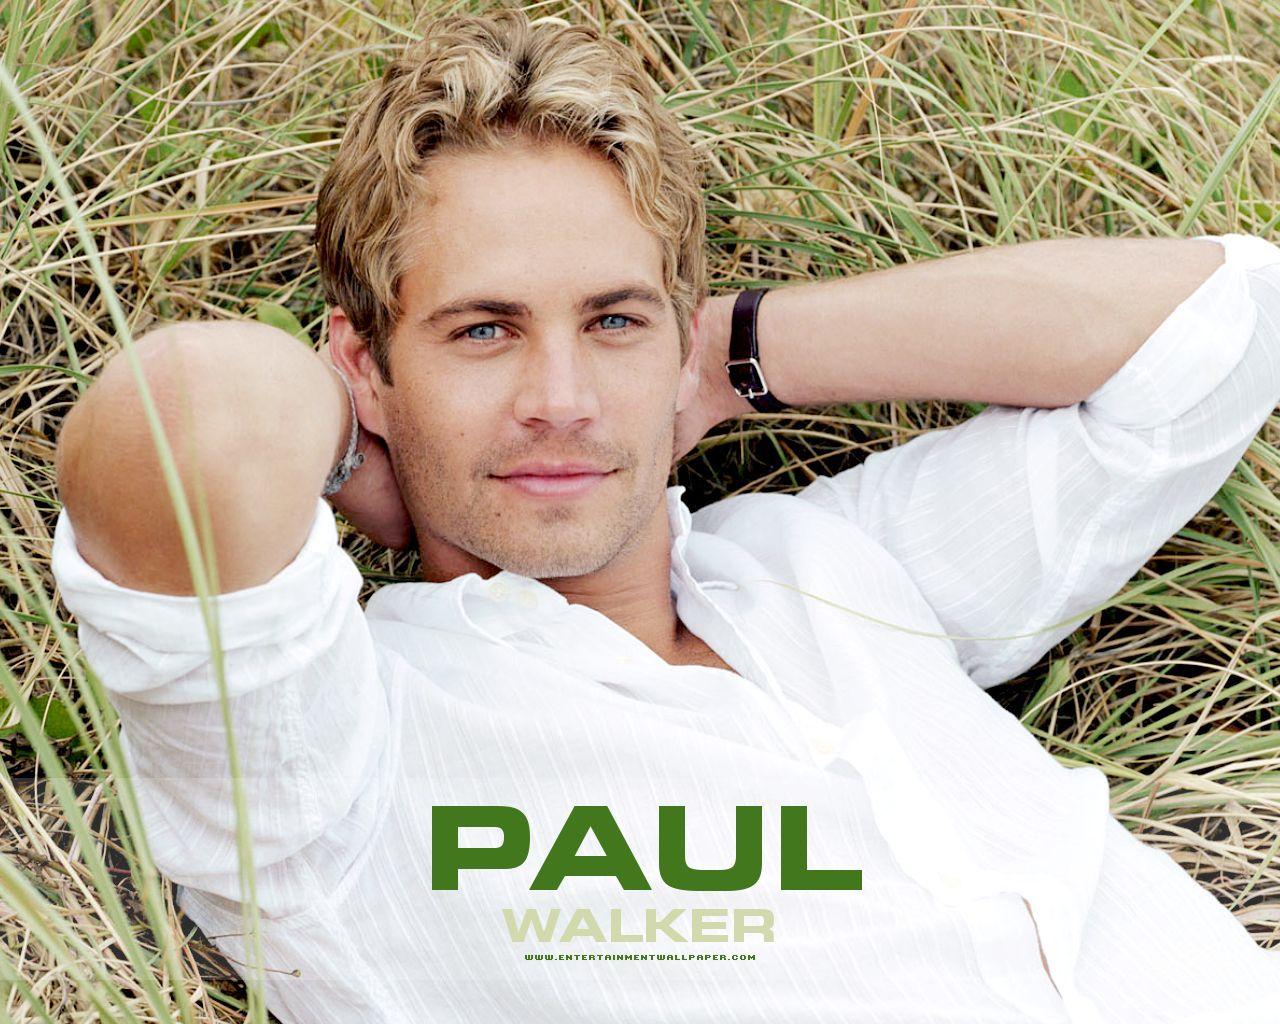 http://4.bp.blogspot.com/-LdFHtq6J7-g/T-yoMgRidII/AAAAAAAADEs/Y4DJ7iDEweU/s1600/paul_walker021.jpg